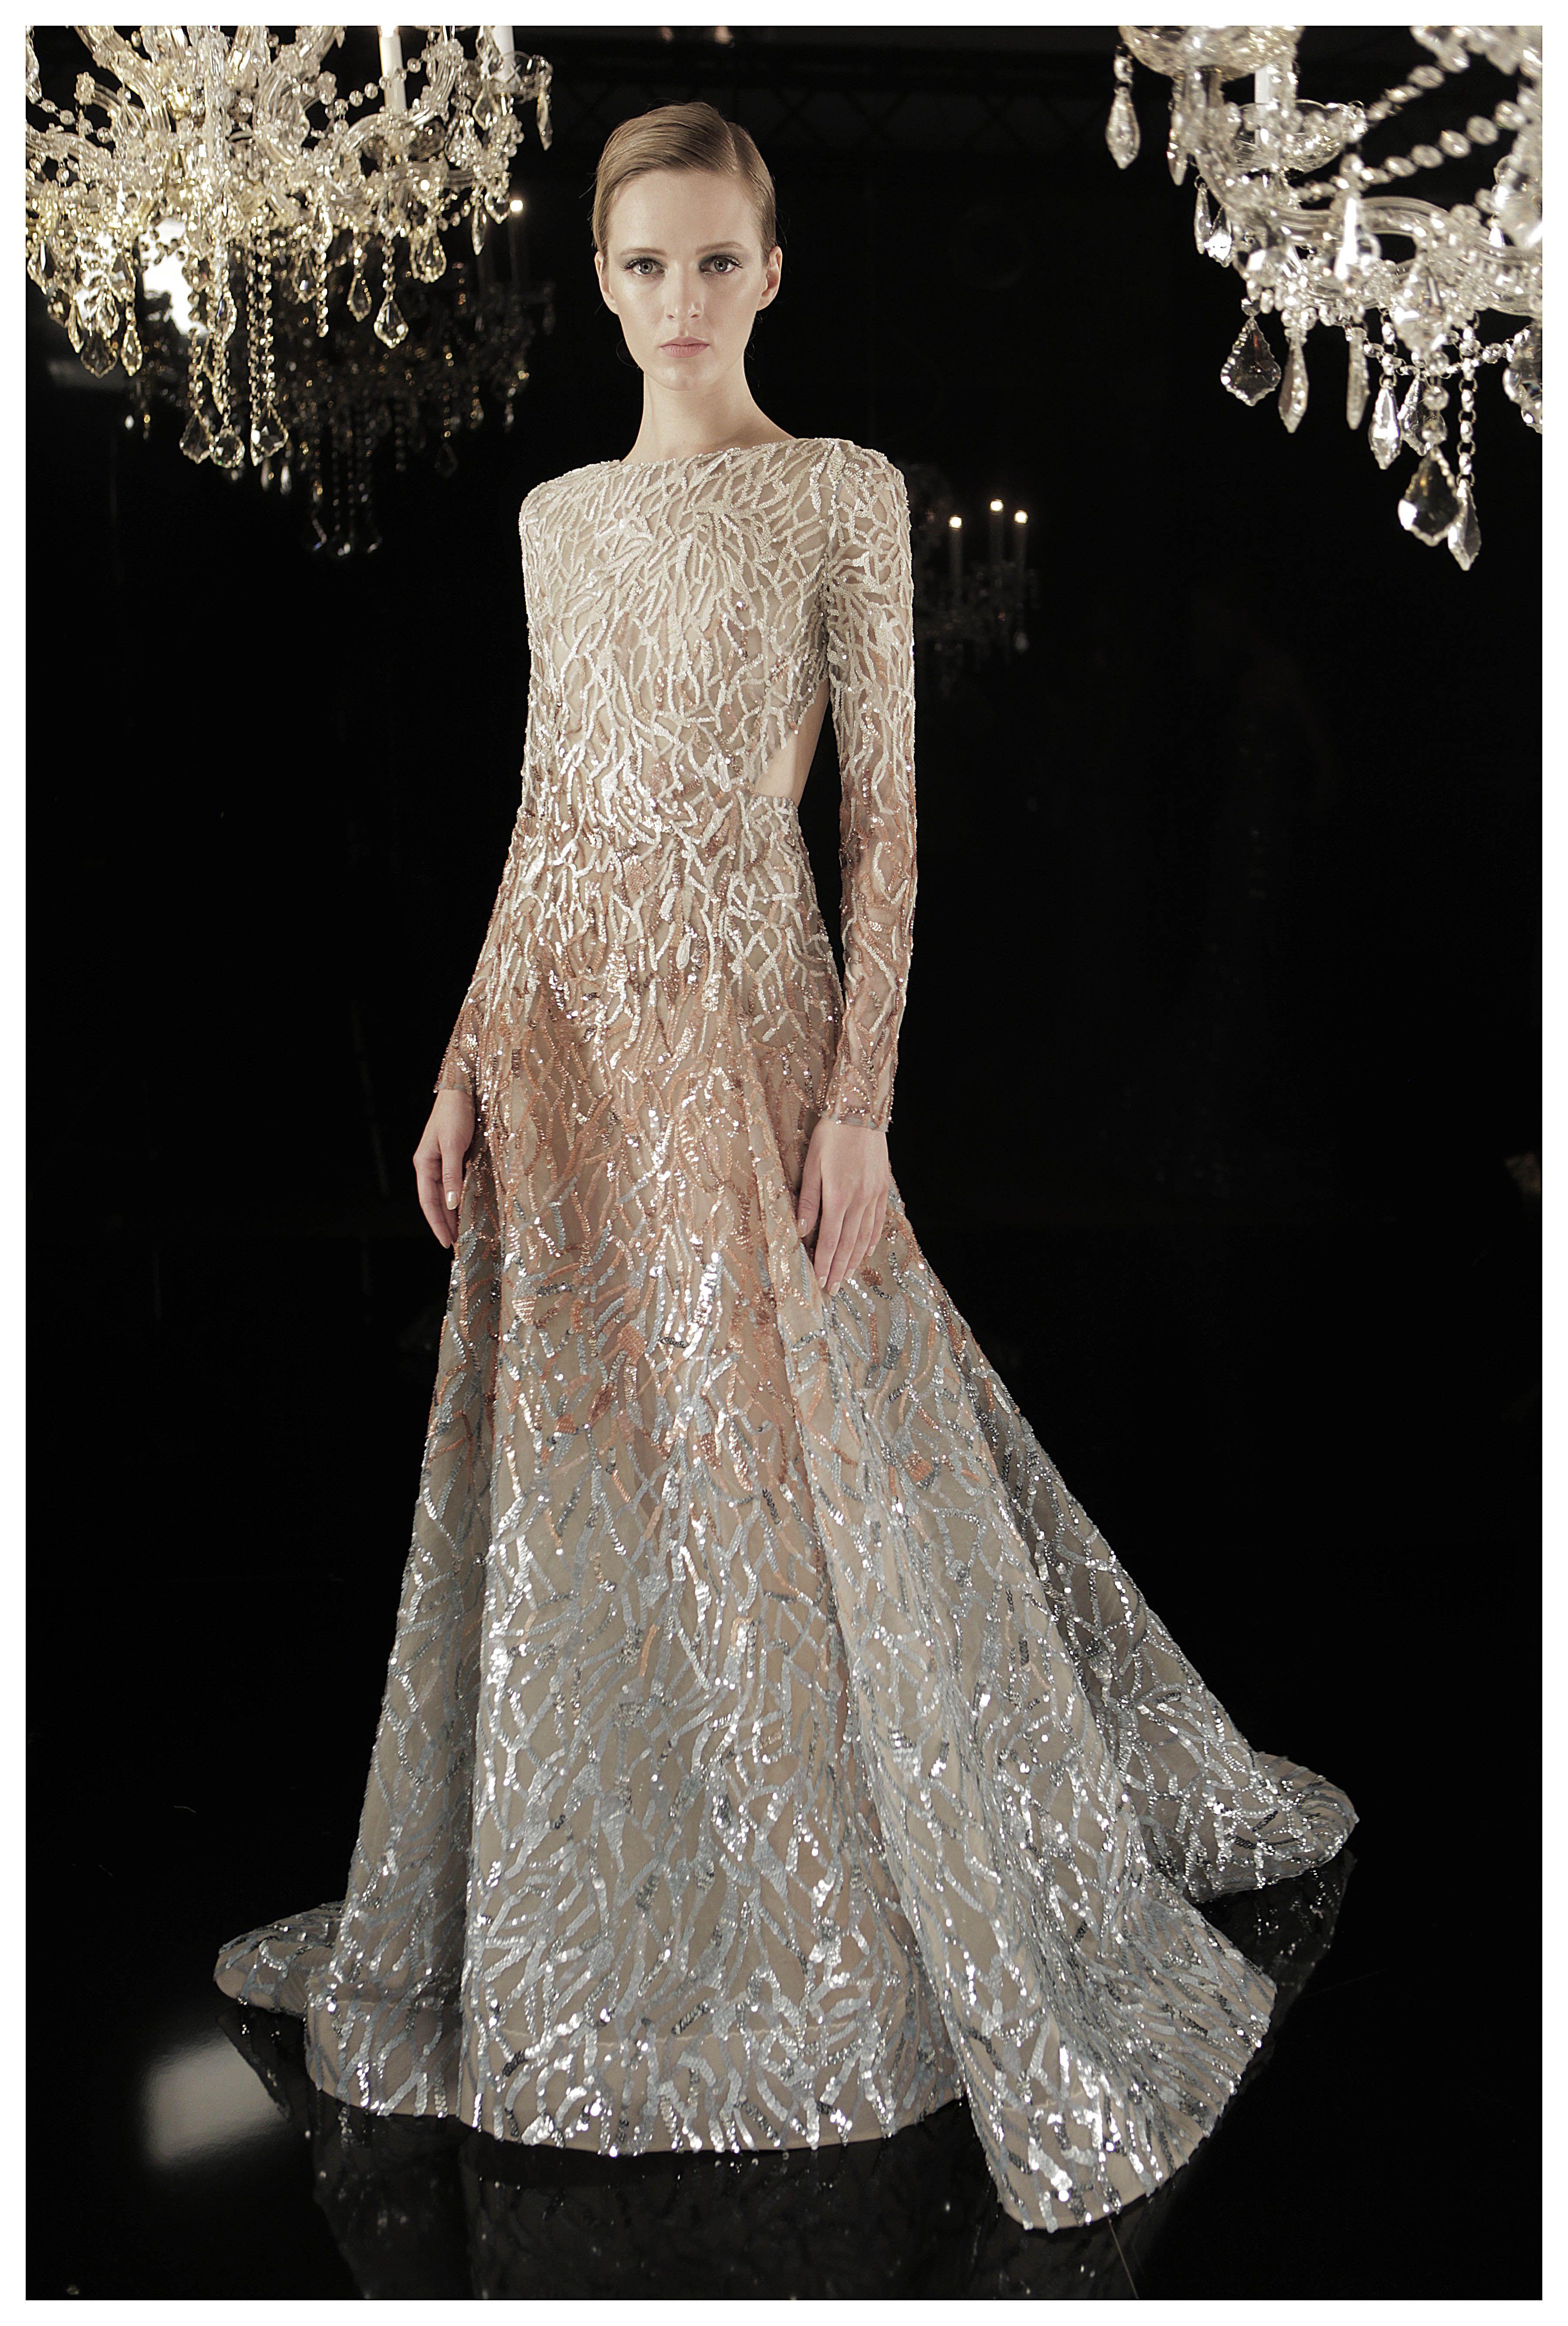 Metallic wedding dress  ELIE SAAB Haute Couture Fall Winter   Studio shopping